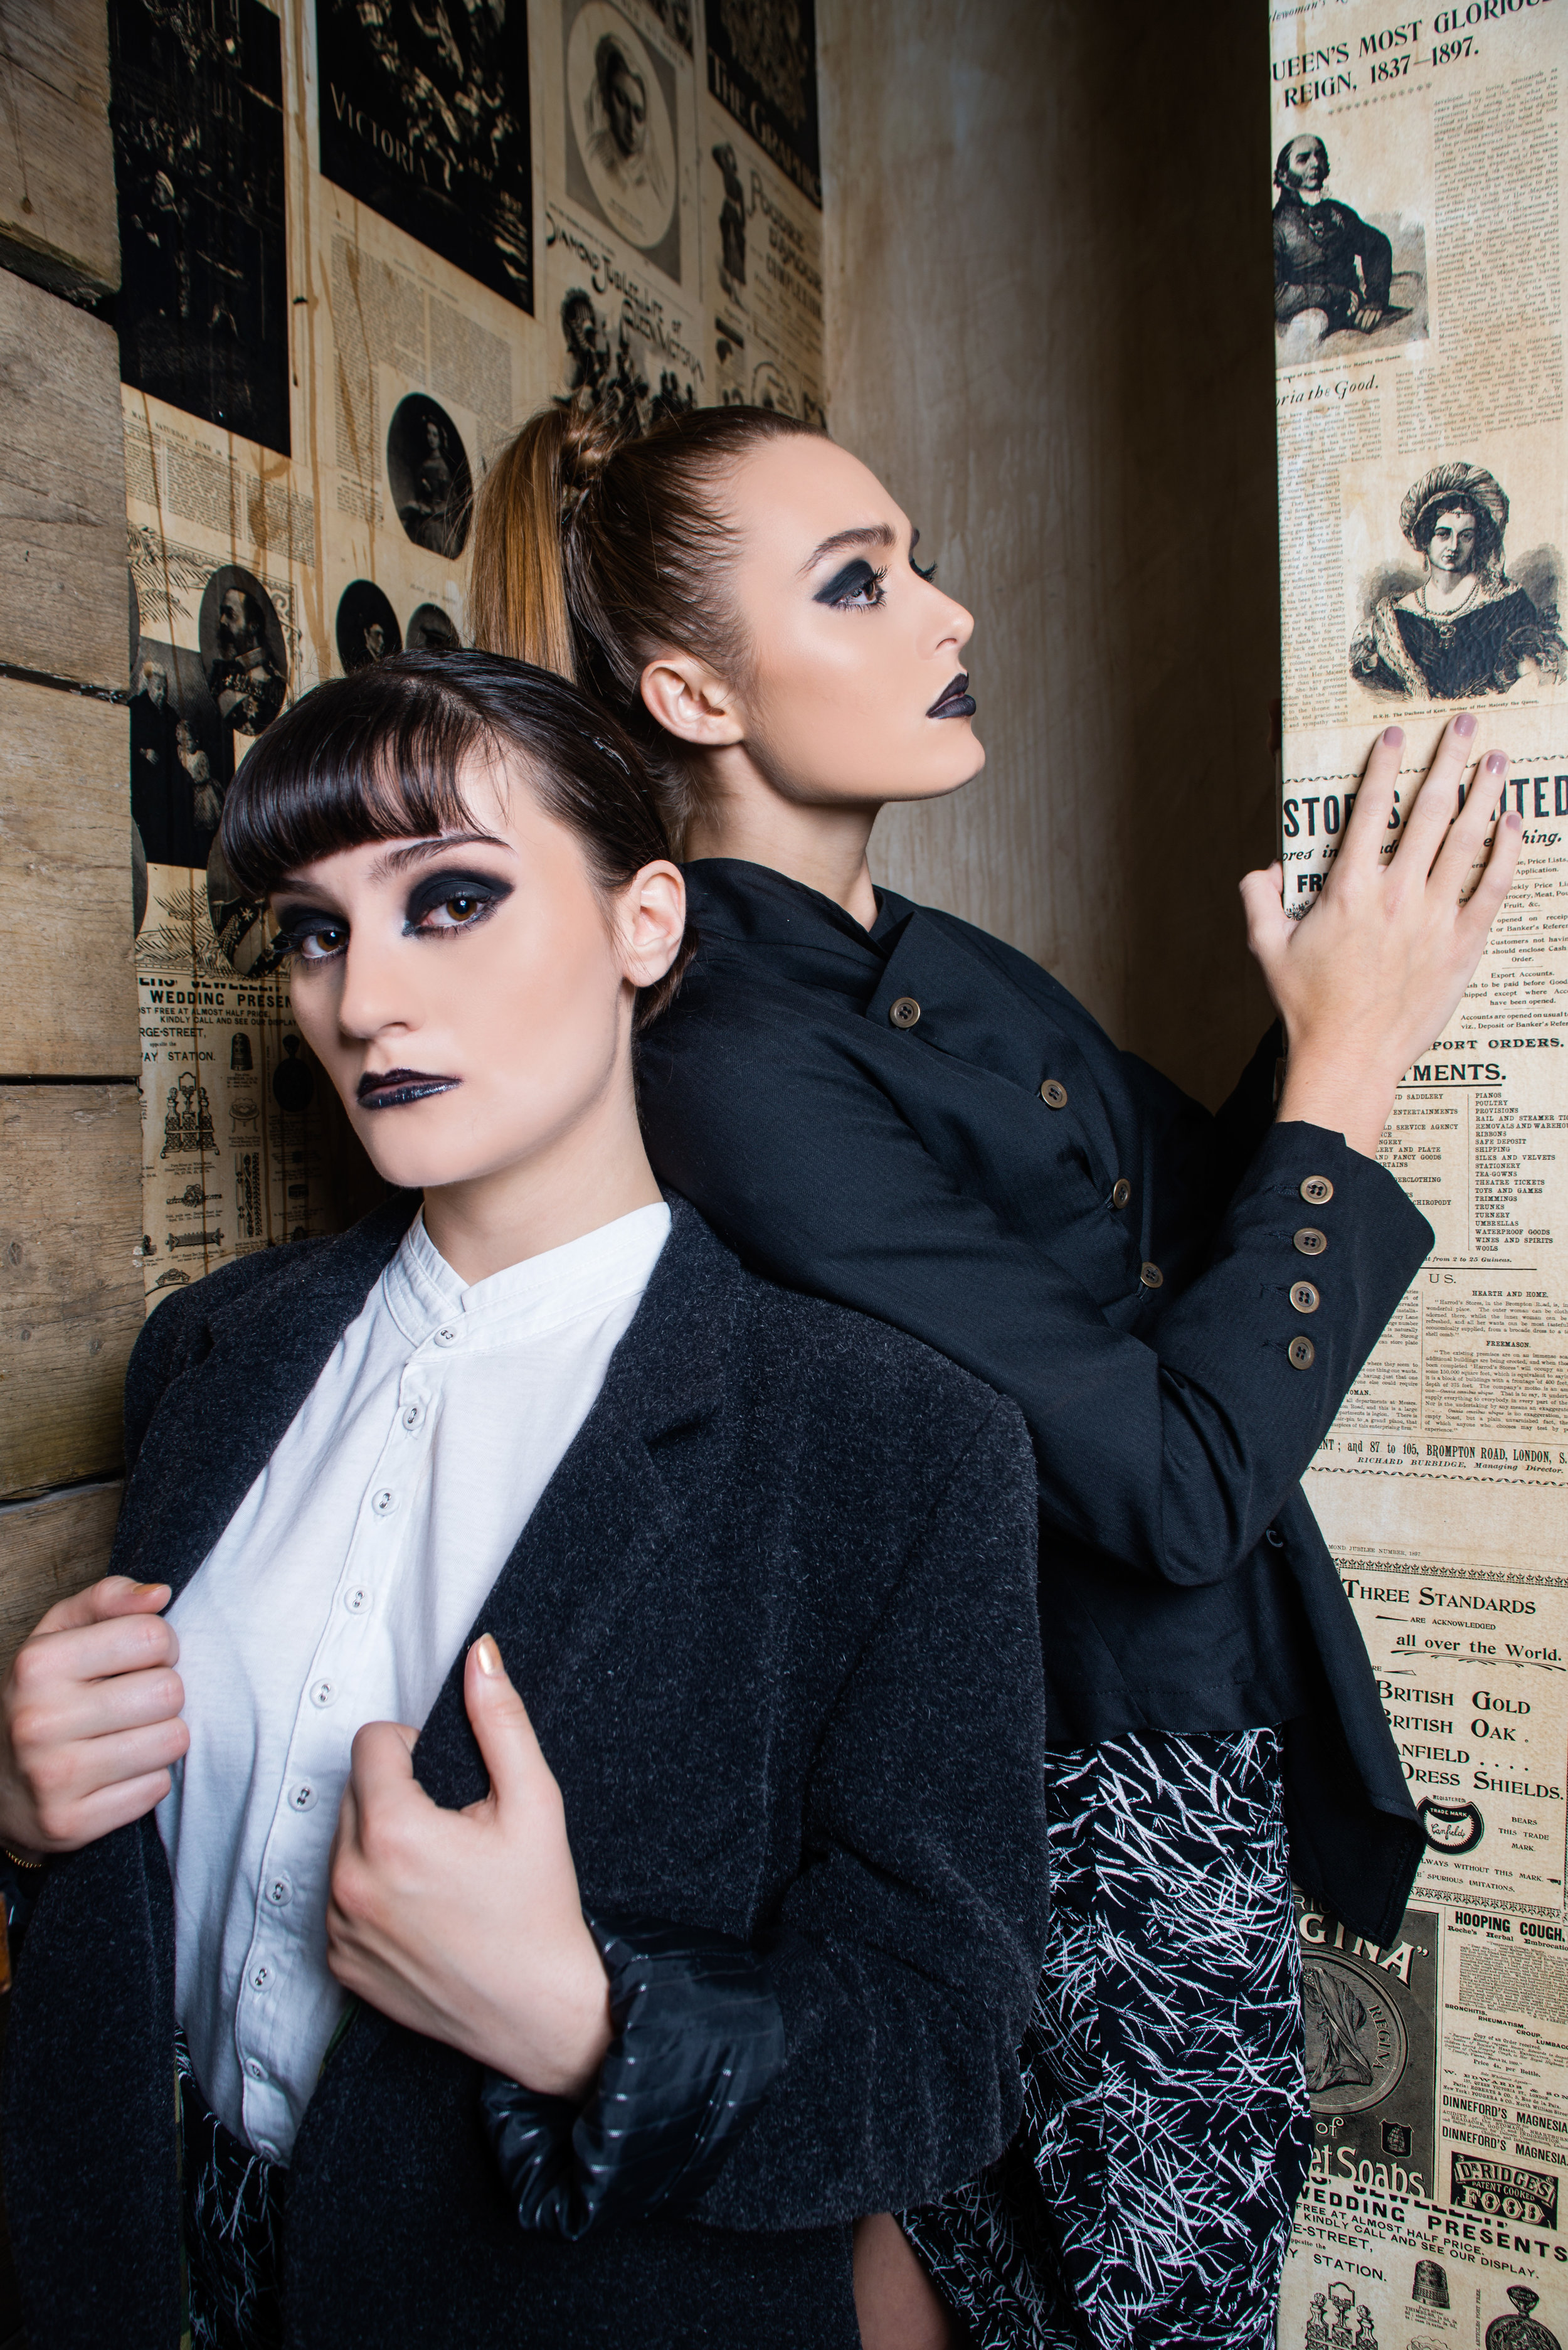 zaramia-ava-zaramiaava-leeds-fashion-designer-ethical-sustainable-tailored-minimalist-jacket-mio-mai-coat-jacket-print-shirt-trousers-top-versatile-drape-cowl-styling-shop-womenswear-3